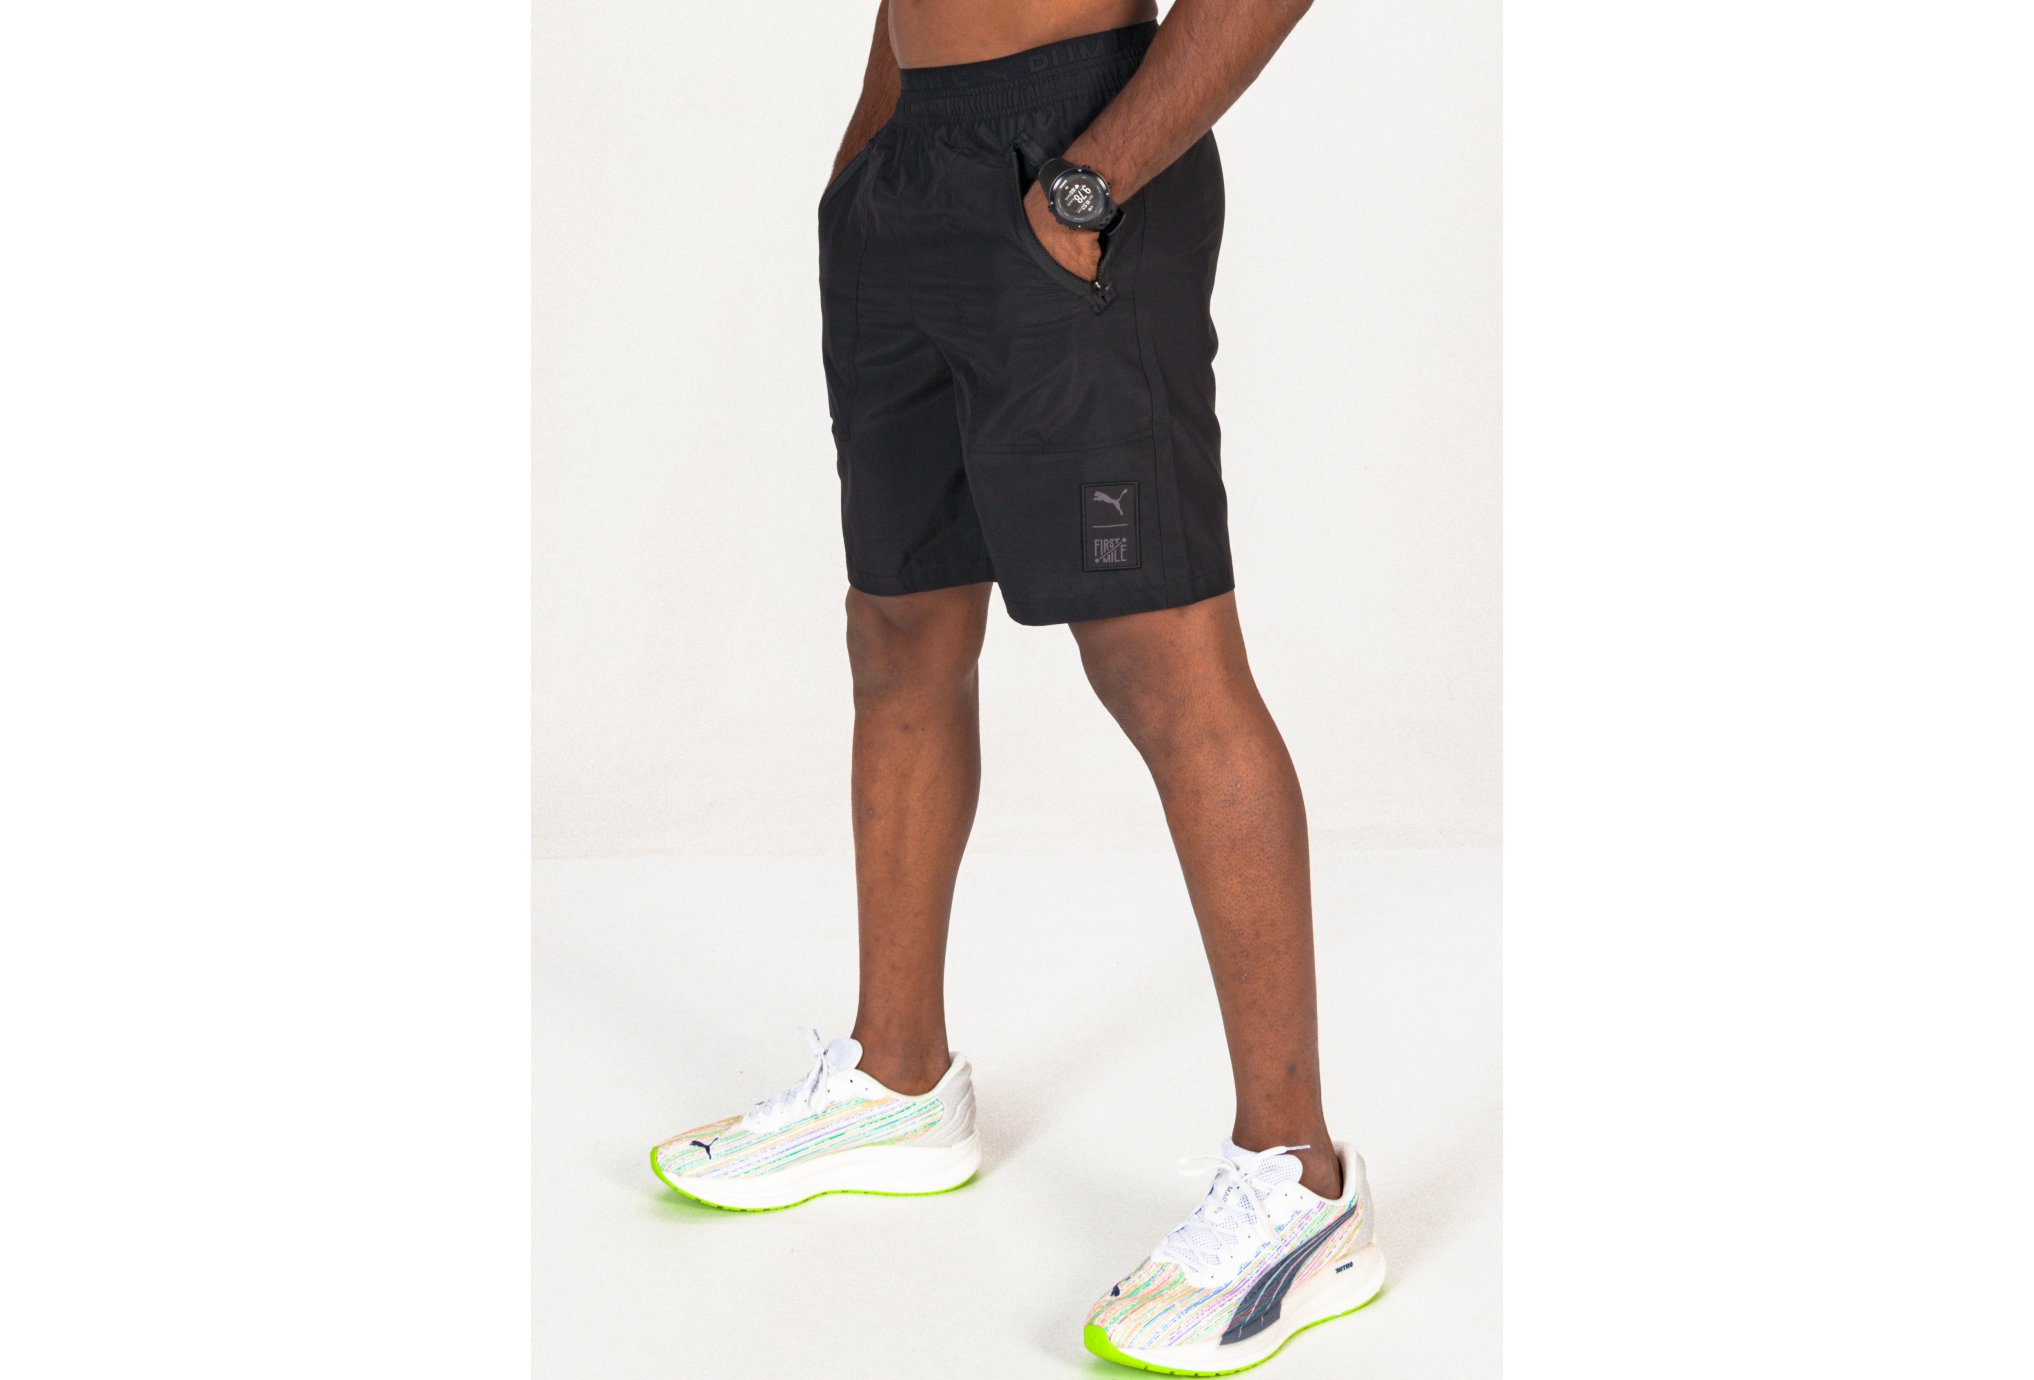 Puma Train First Mile M vêtement running homme